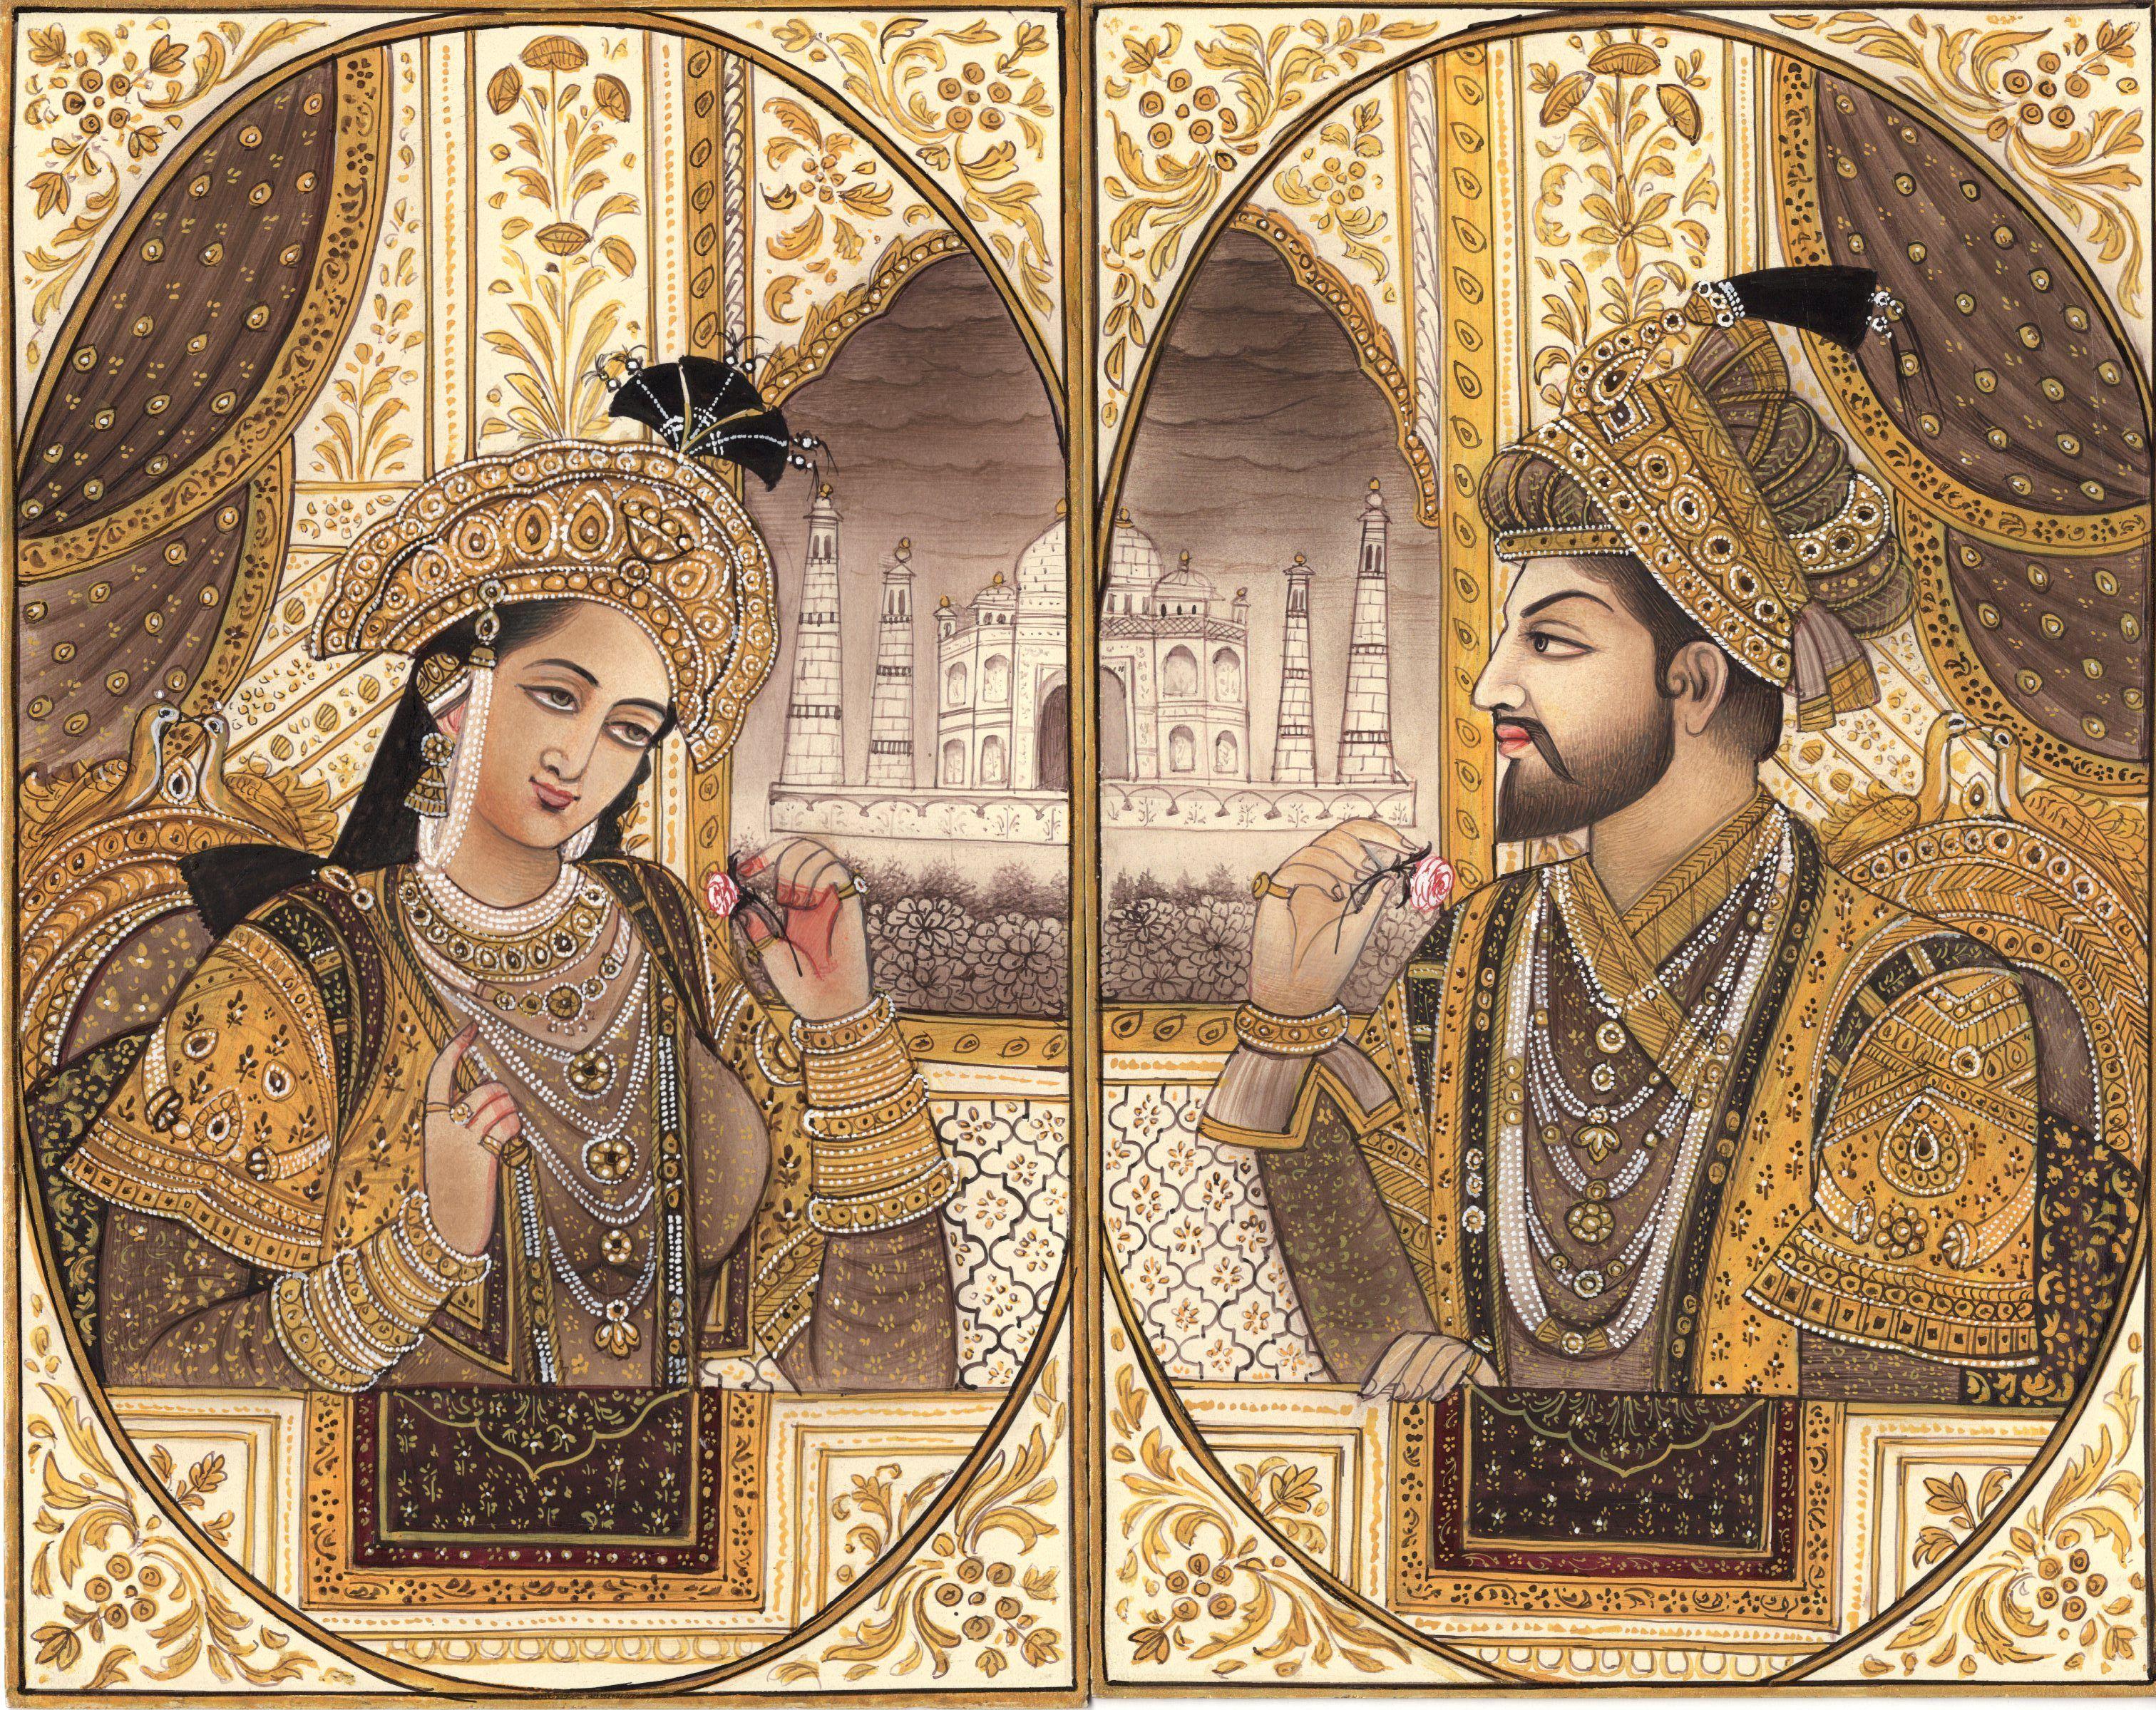 Emperor Shah Jahan Empress Mumtaz Mahal Art Mughal Empire Miniature ...